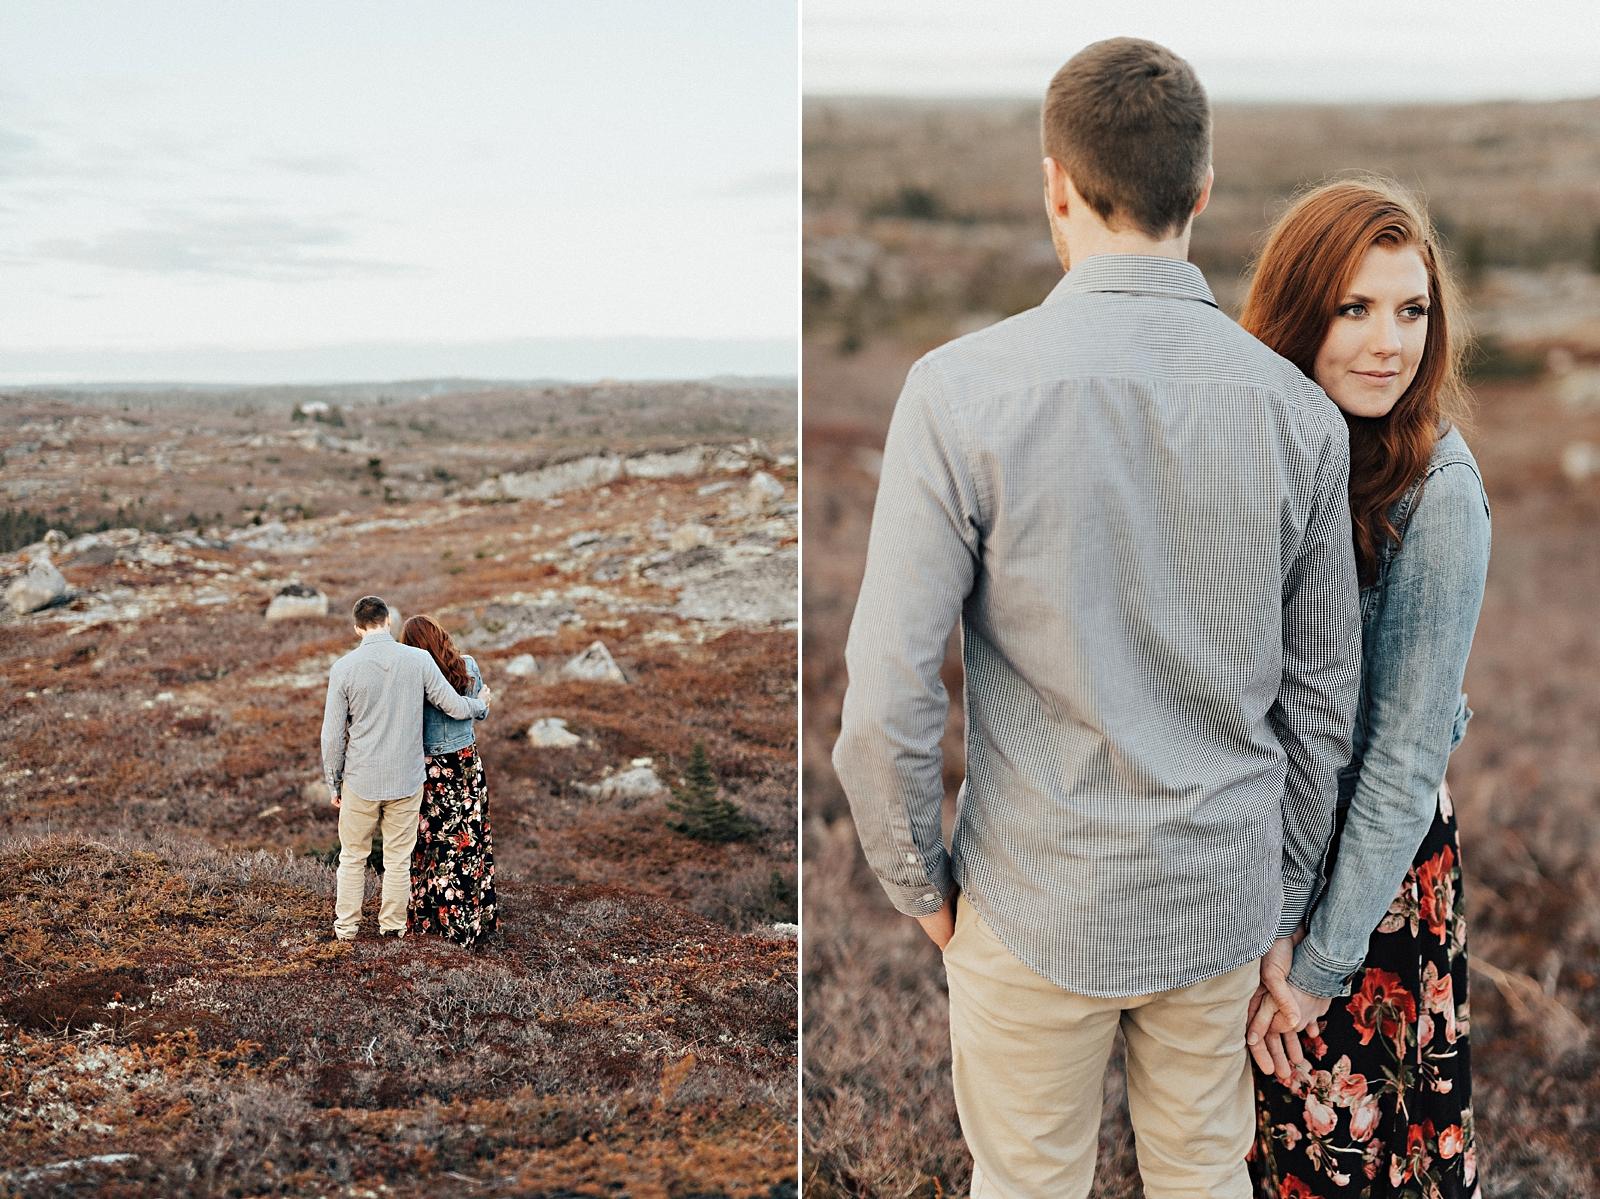 Halifax-Wedding-Photographer_Annie&Ryan_Ocean-Engagement-Shoot_41.jpg